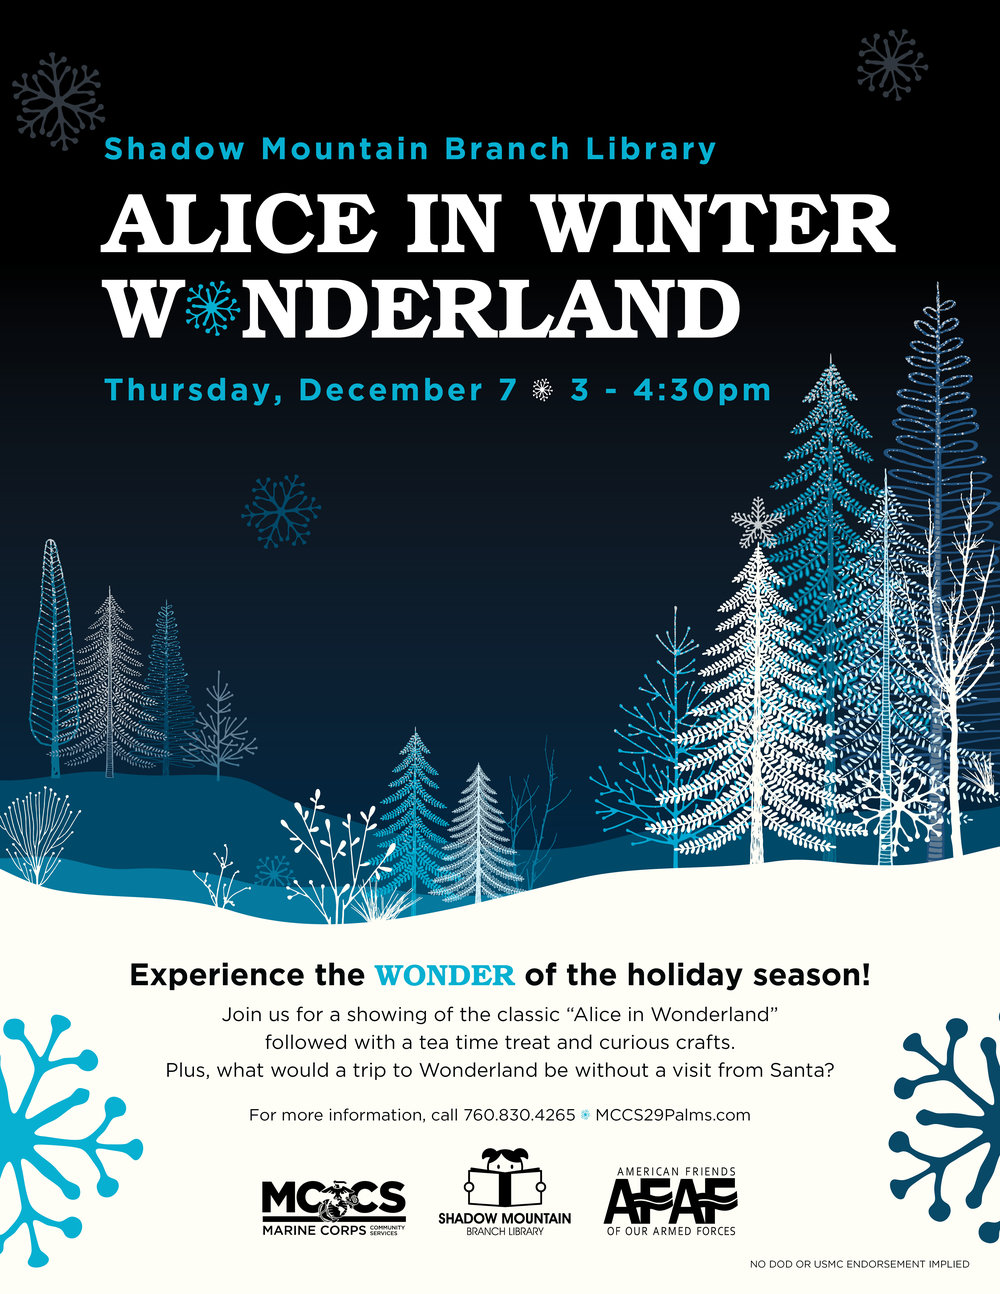 AliceinWinterWonderland120717_Flyer.jpg